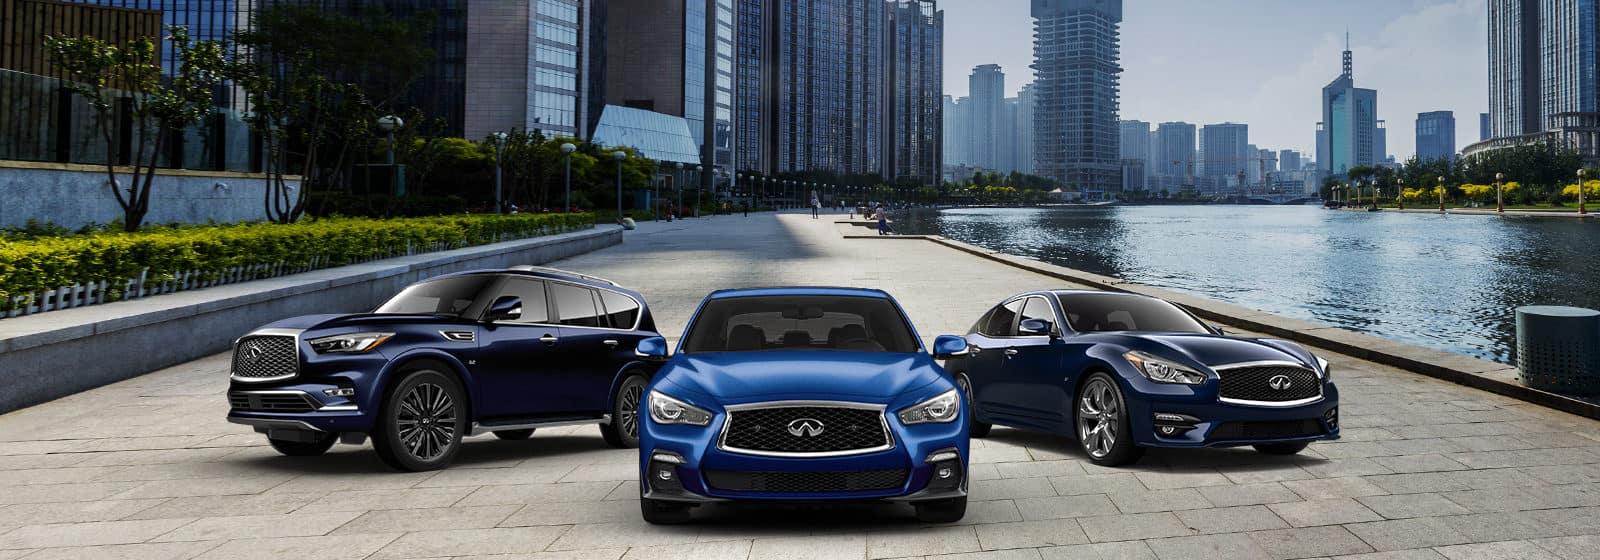 Infiniti Dealer Miami >> South Motors Infiniti Infiniti Dealer In Miami Fl